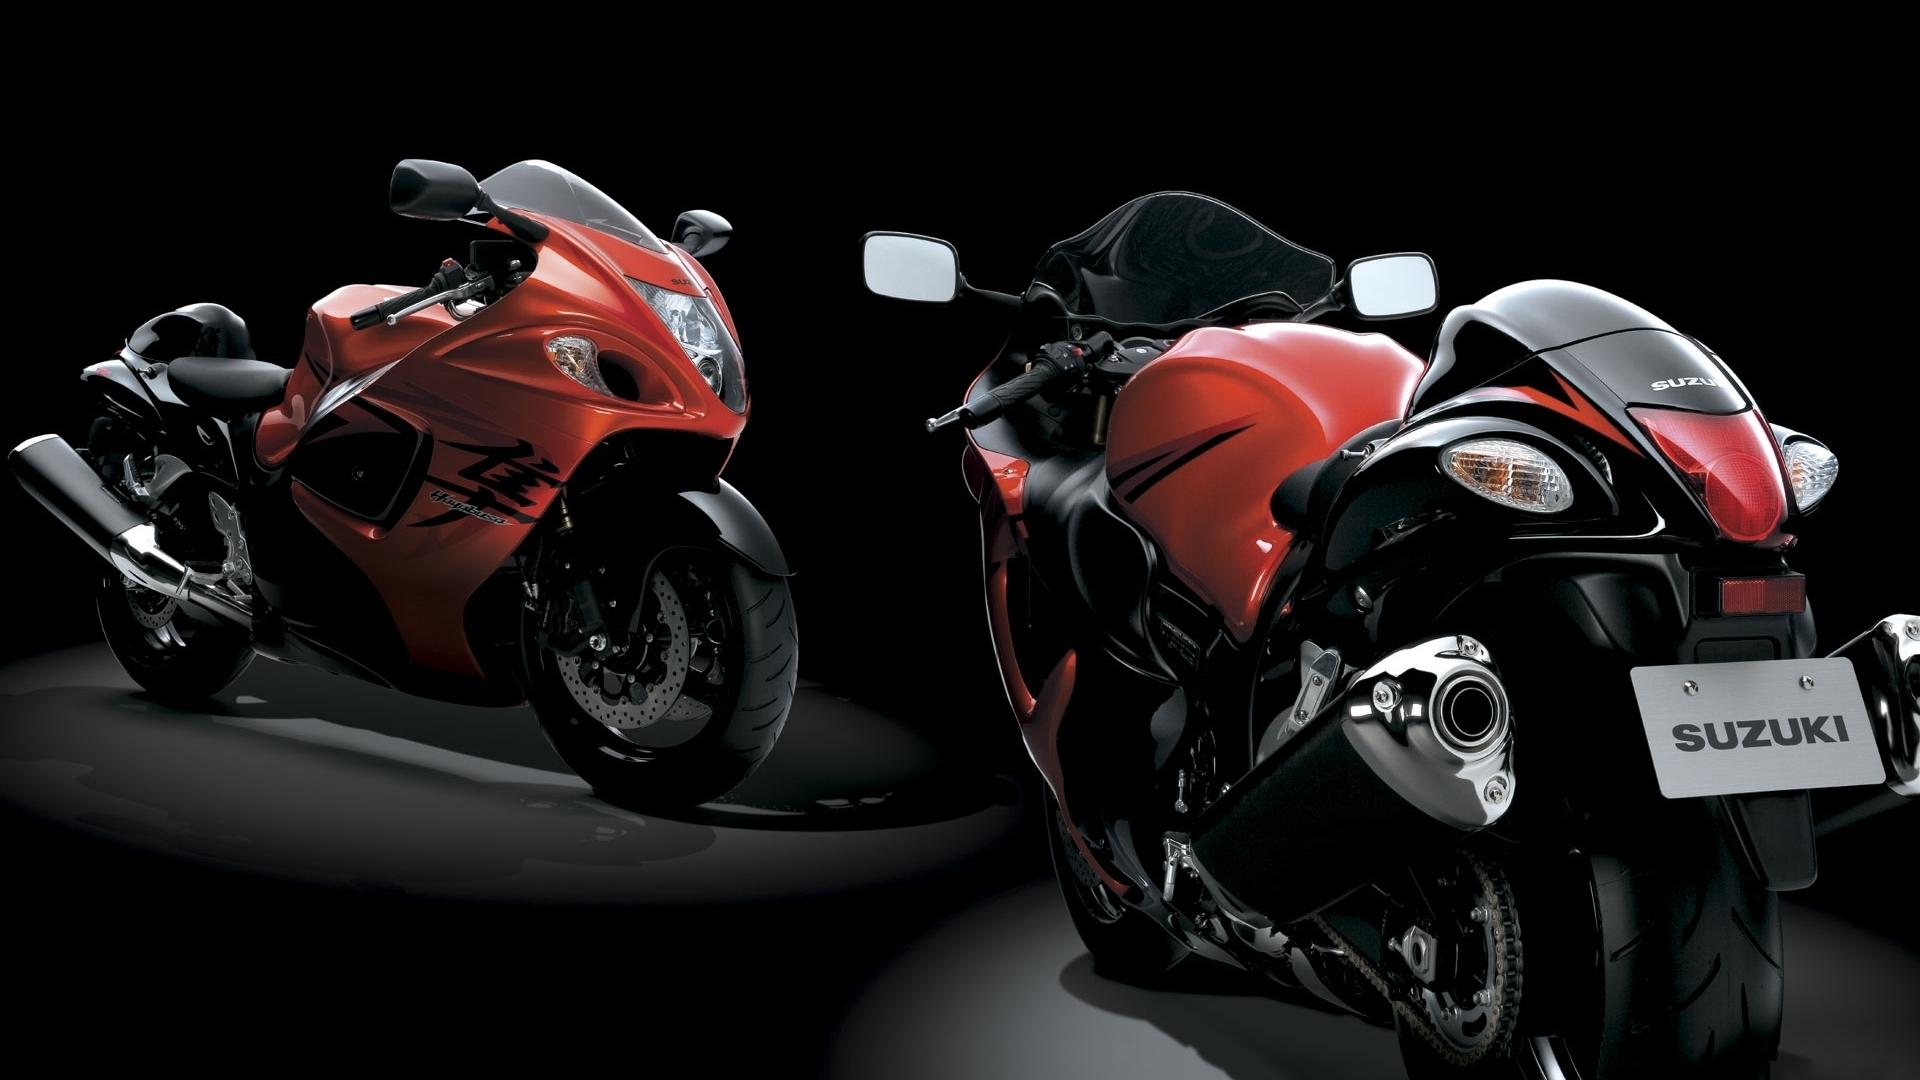 Байк, мотоцикл, обои, крупно